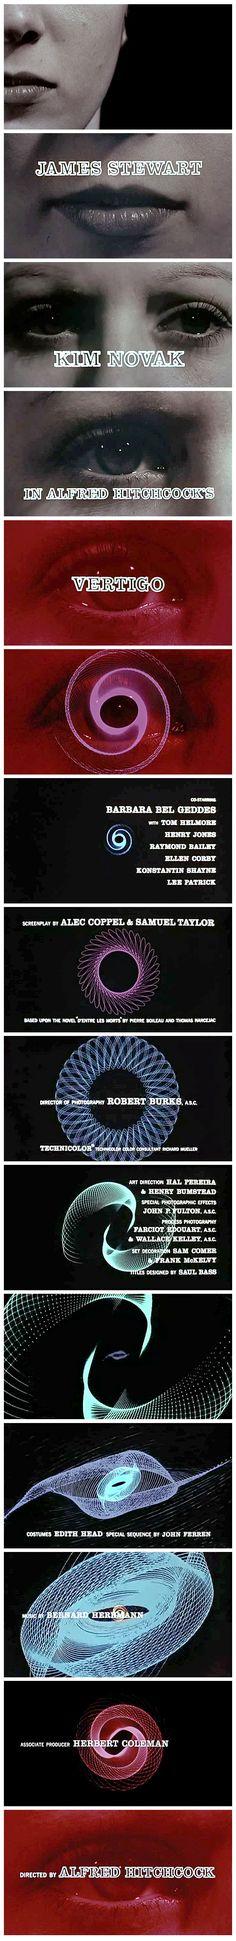 "Saul Bass title designs, ""Vertigo,"" Alfred Hitchcock, 1958"